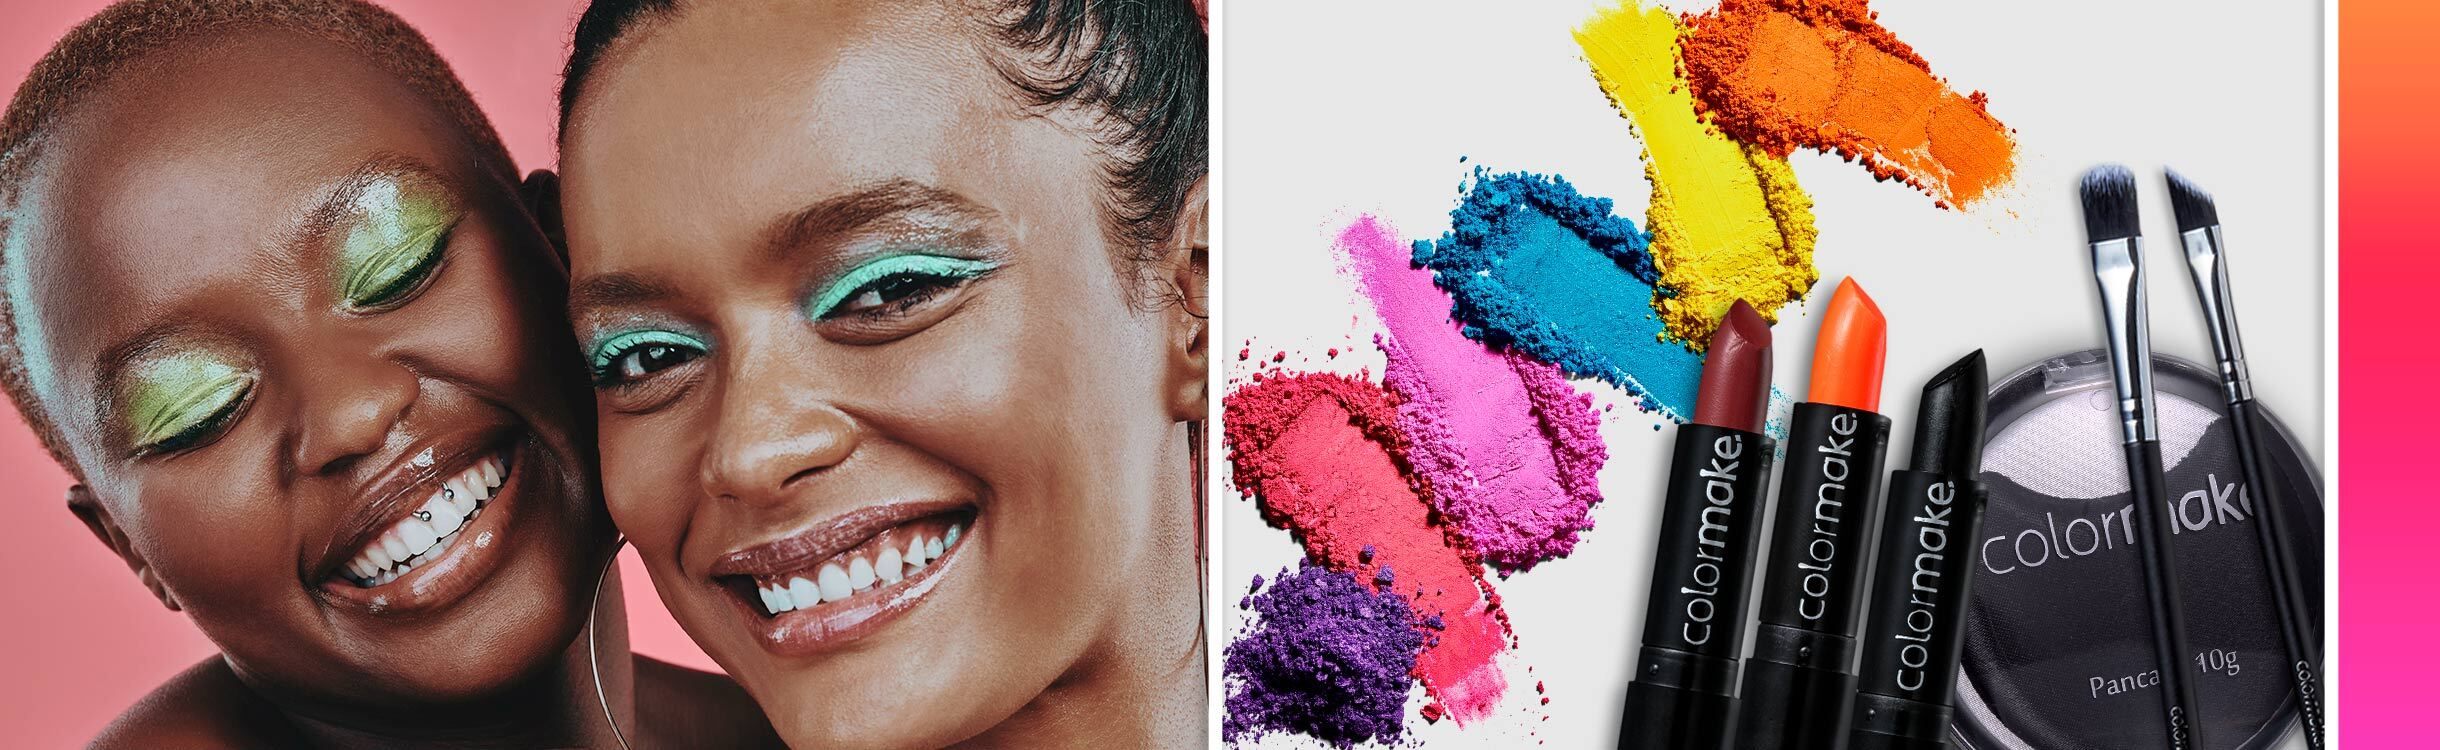 Maquiagem Colormake